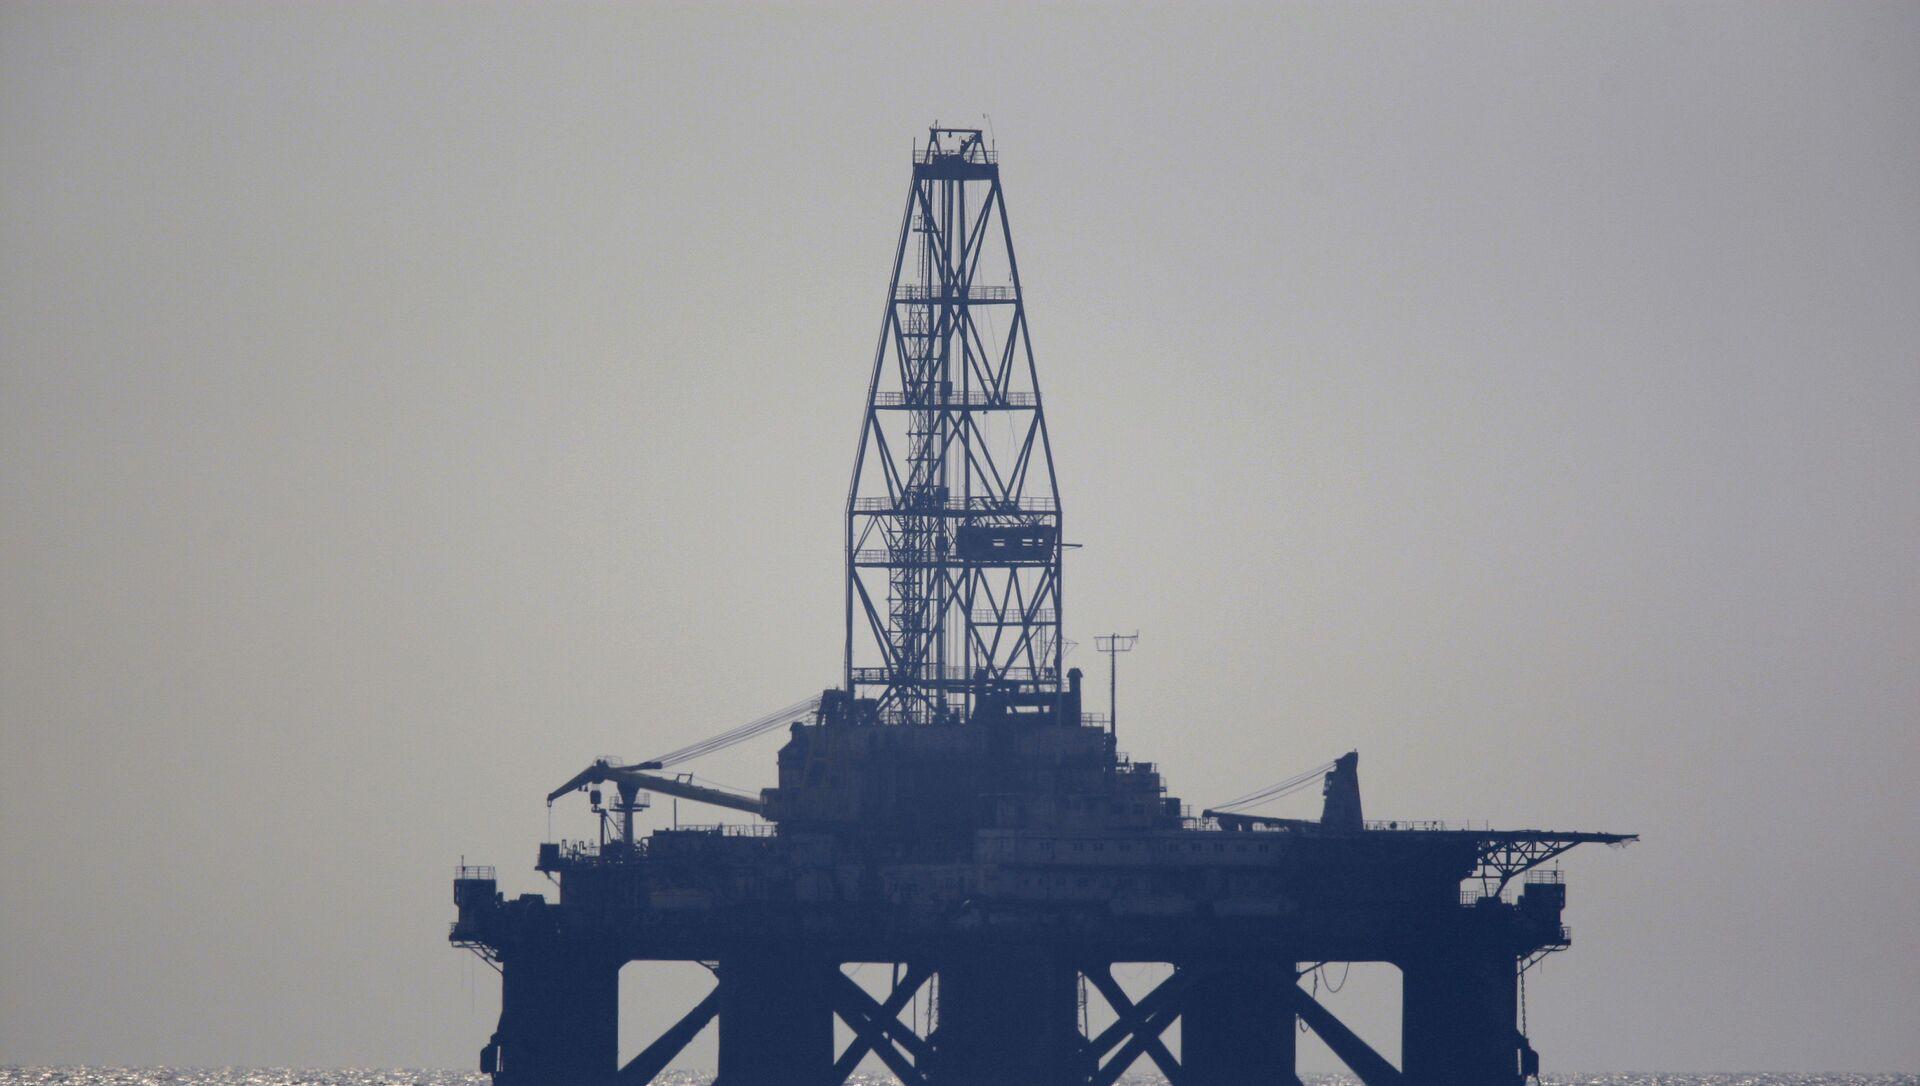 Нефтяная платформа в Каспийском море - Sputnik Азербайджан, 1920, 13.08.2021